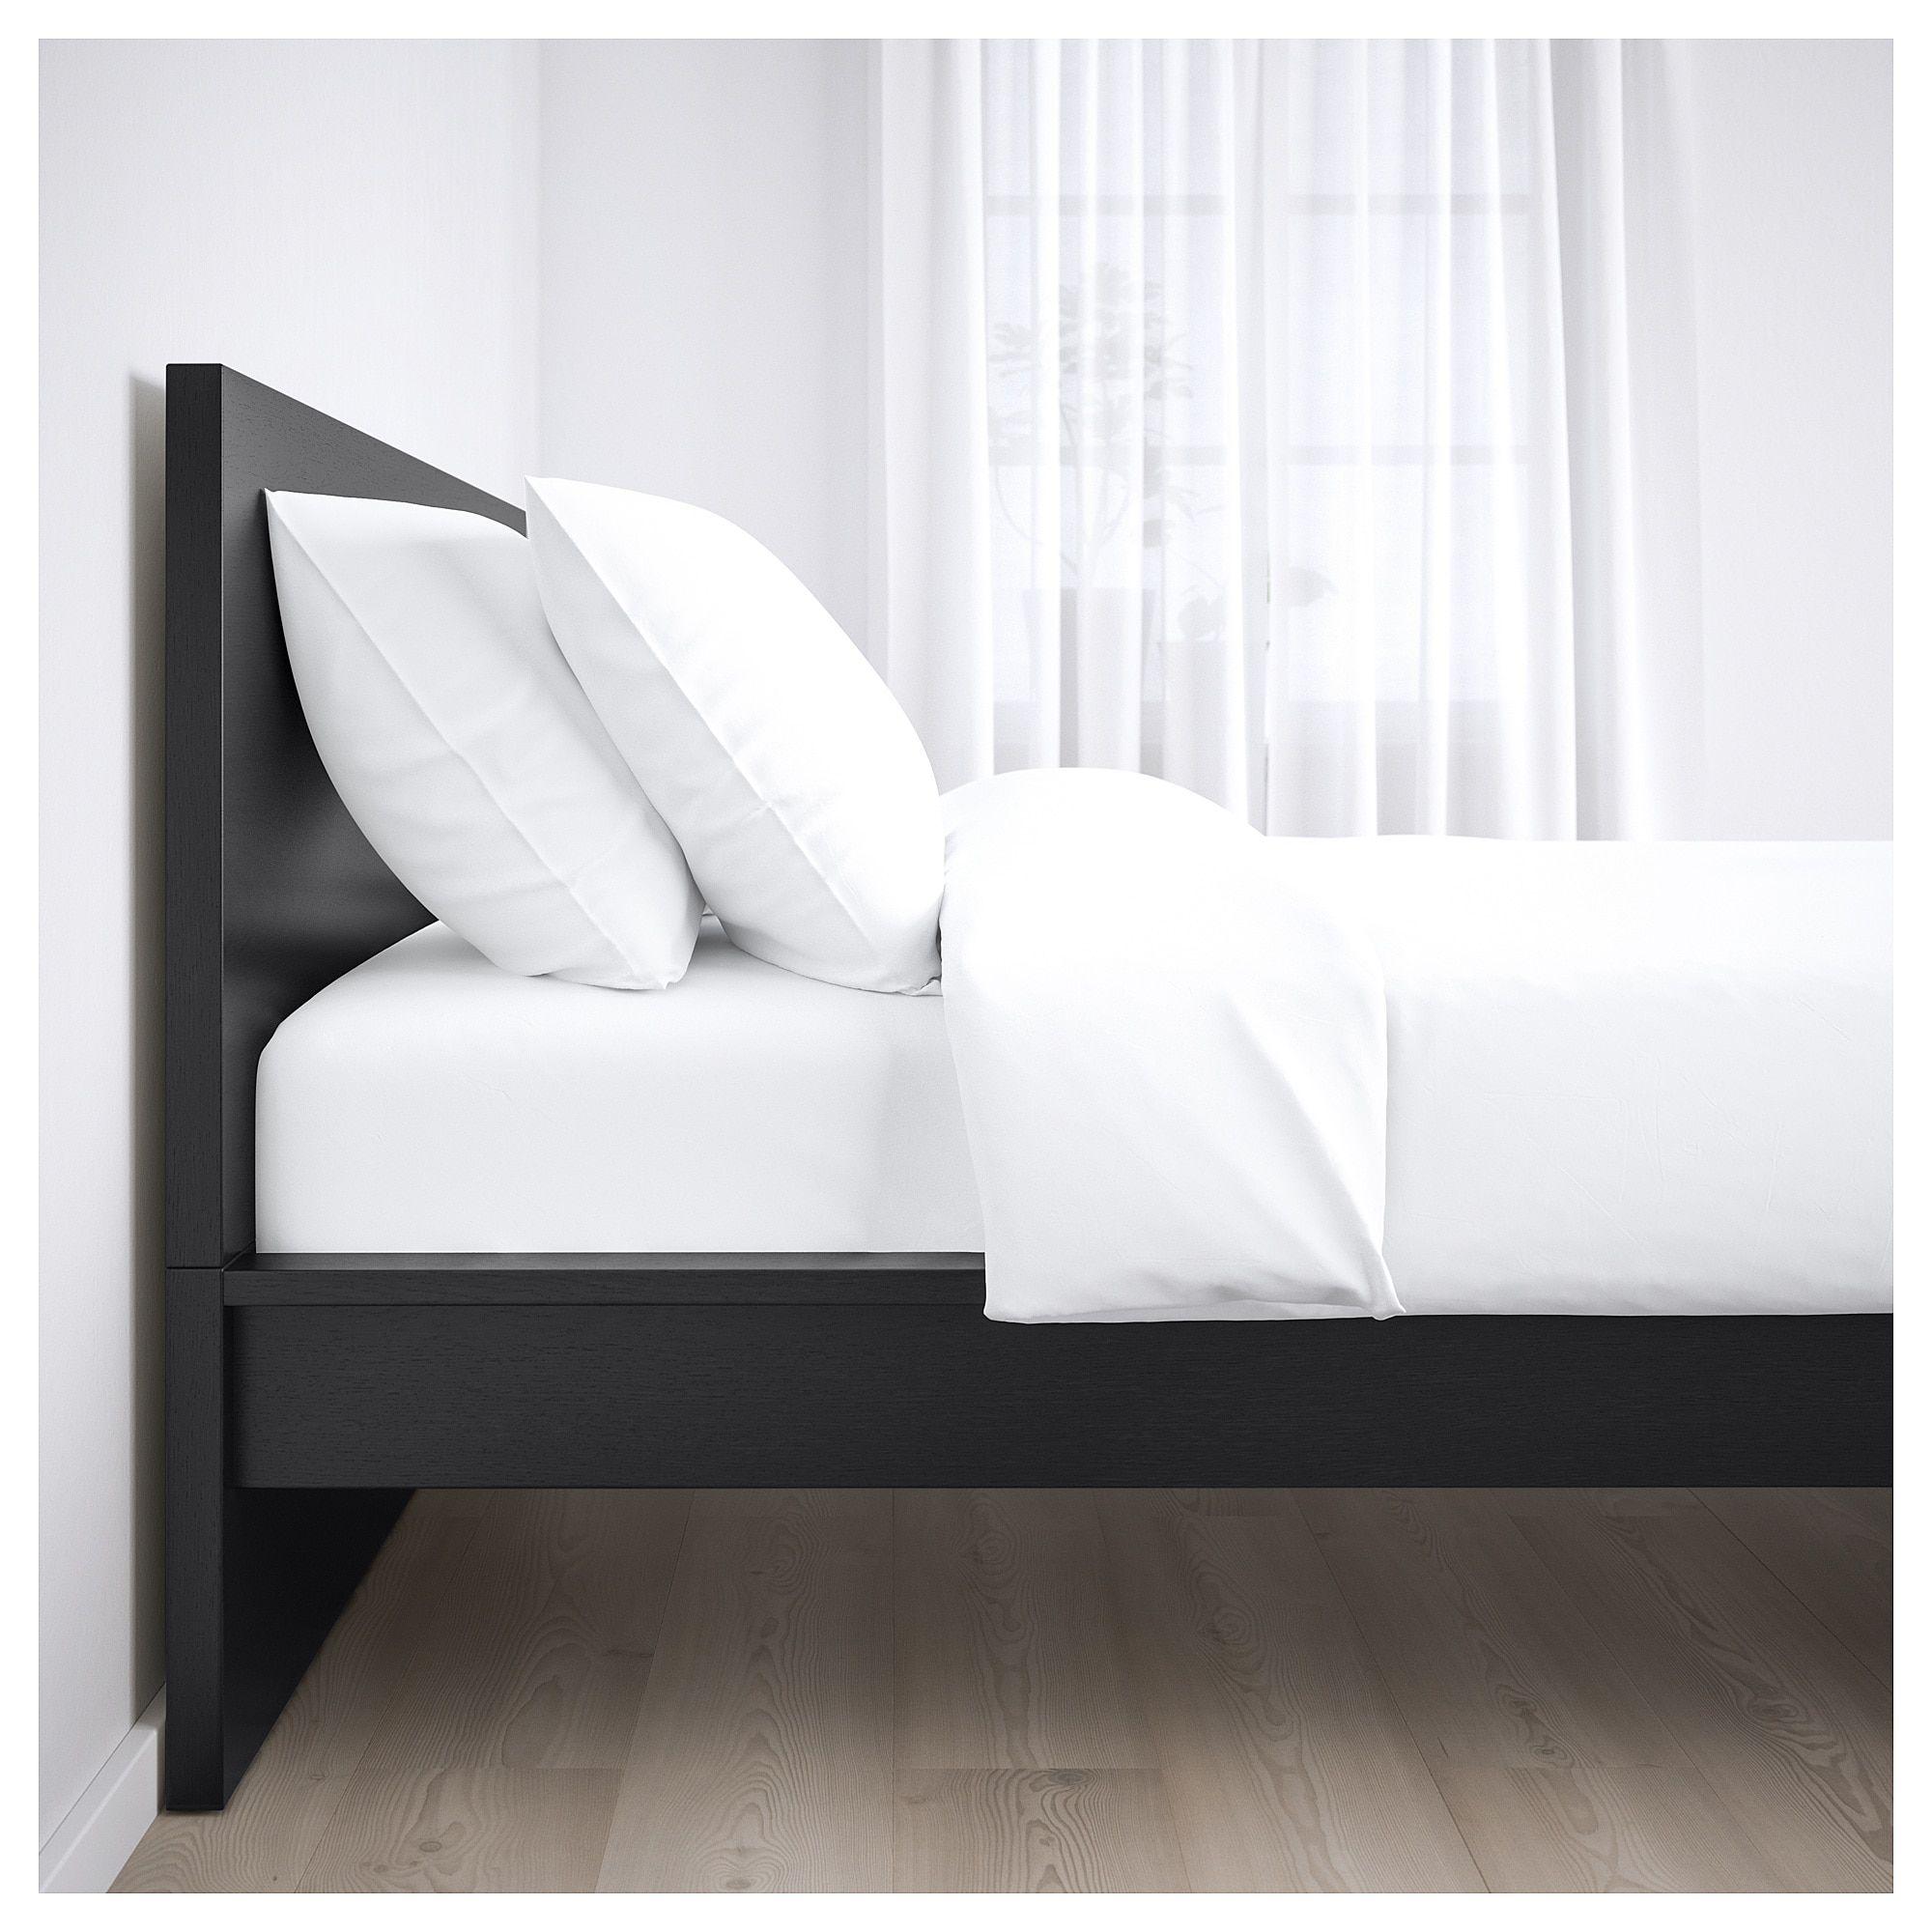 Ikea Malm Black Brown Luroy Bed Frame High Malm Bed Frame Malm Bed Bed Frame